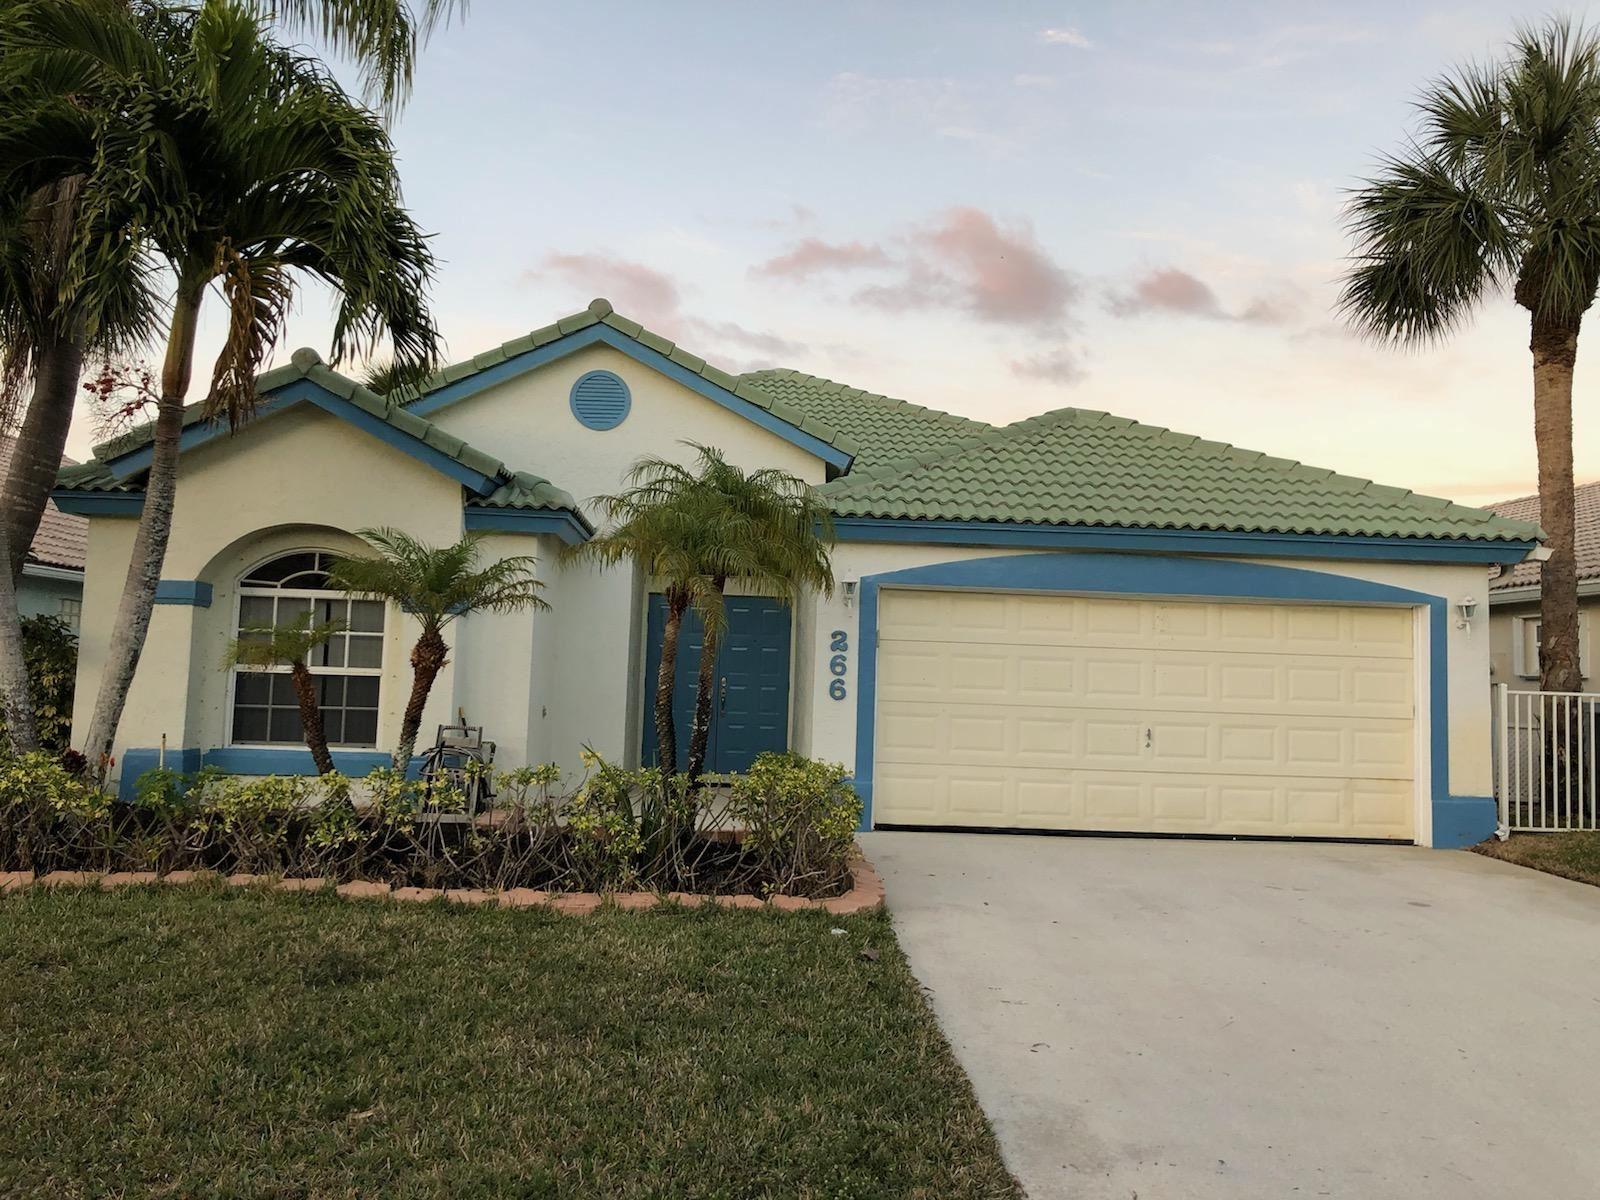 266 E Saratoga Boulevard, Royal Palm Beach, FL 33411 - #: RX-10690473